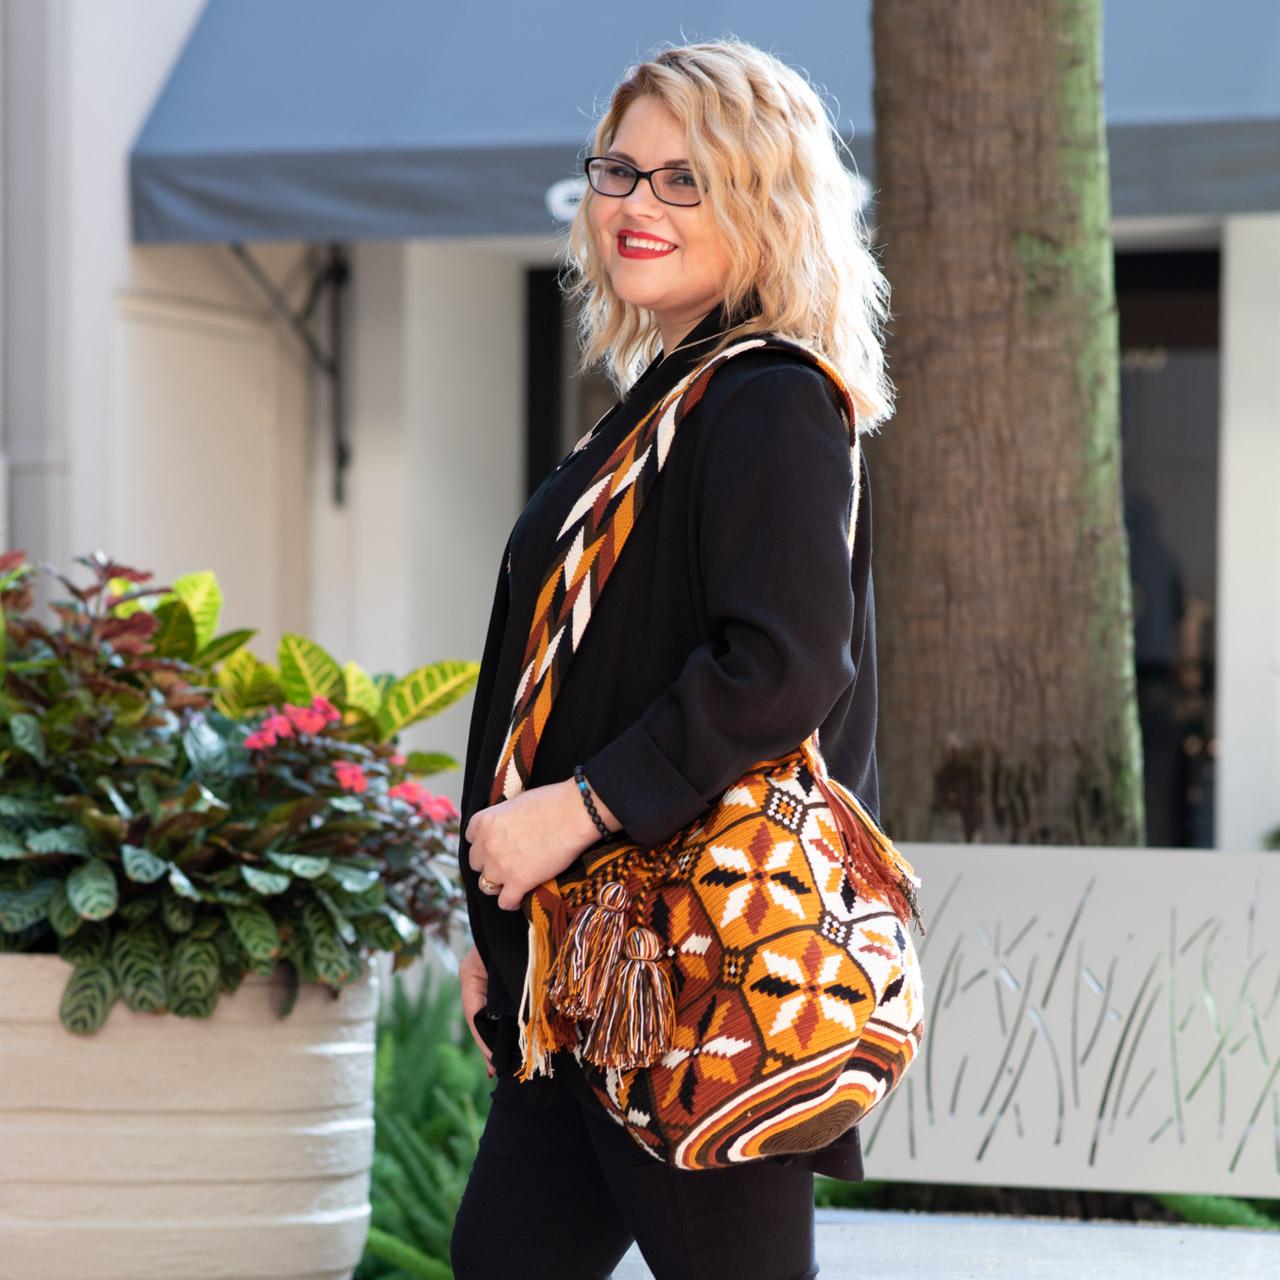 lady with handbag The Woodlands TX Market Street